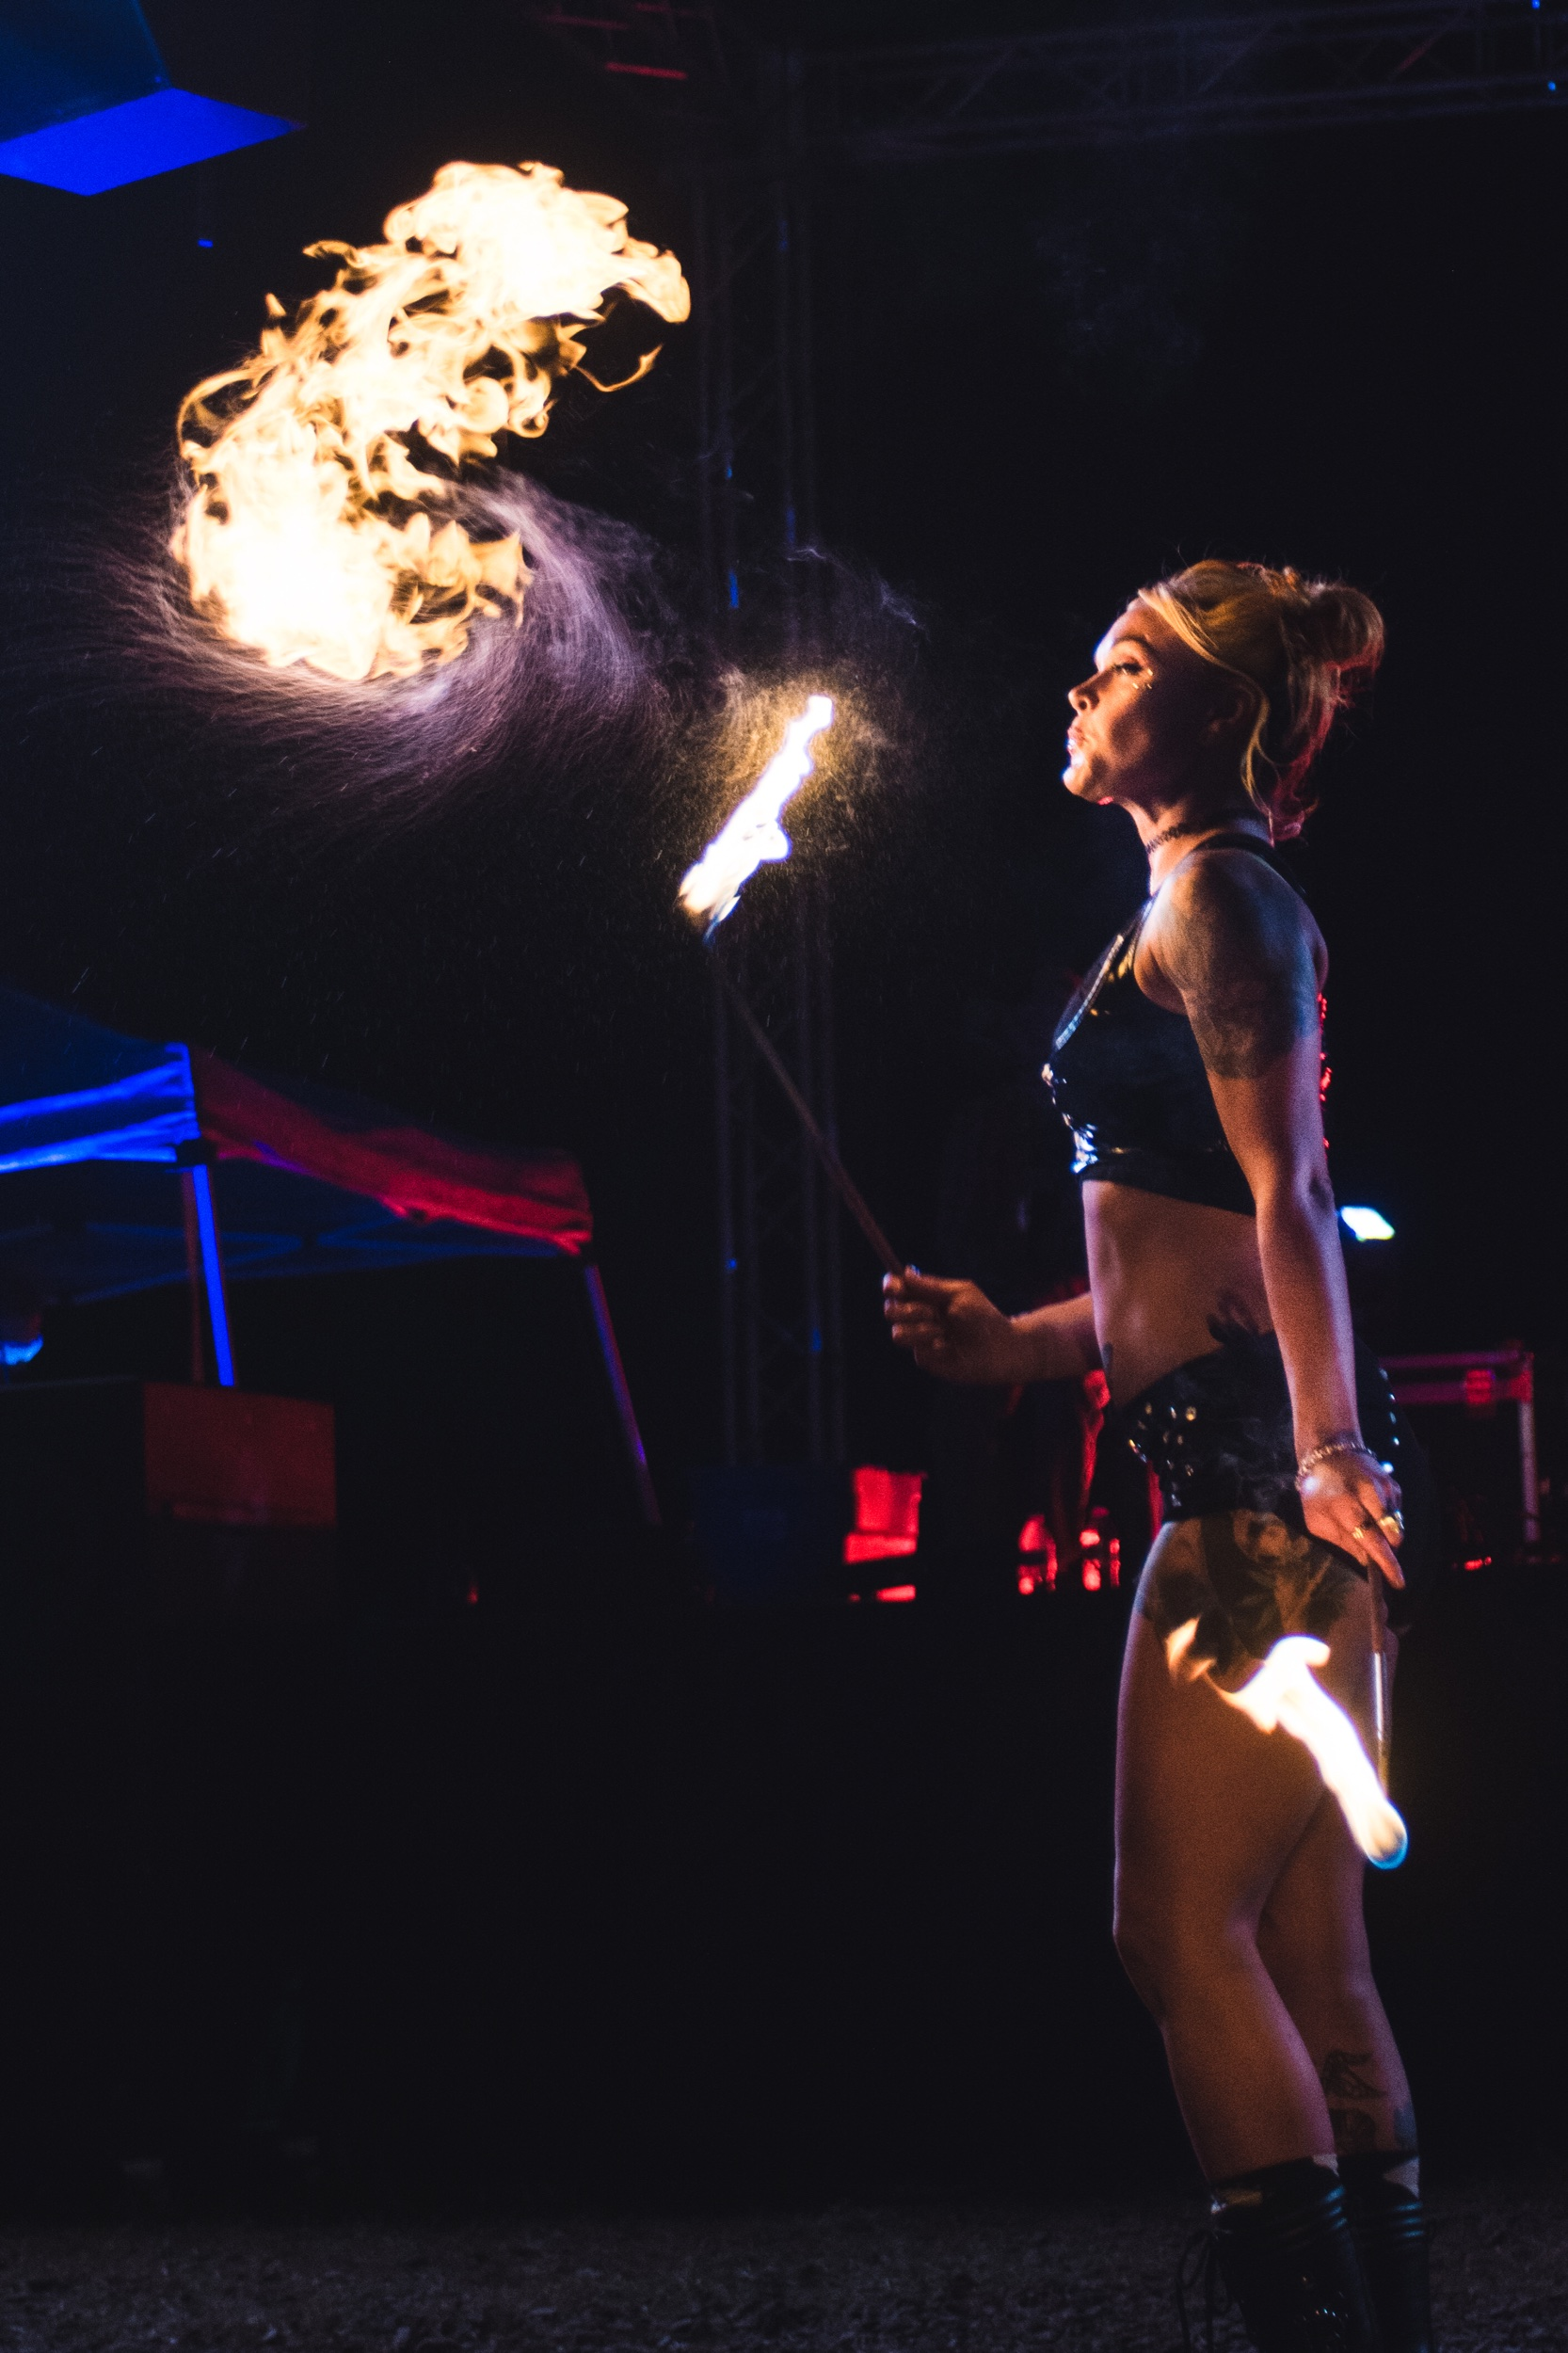 Lanternfest 2k19-66.jpeg